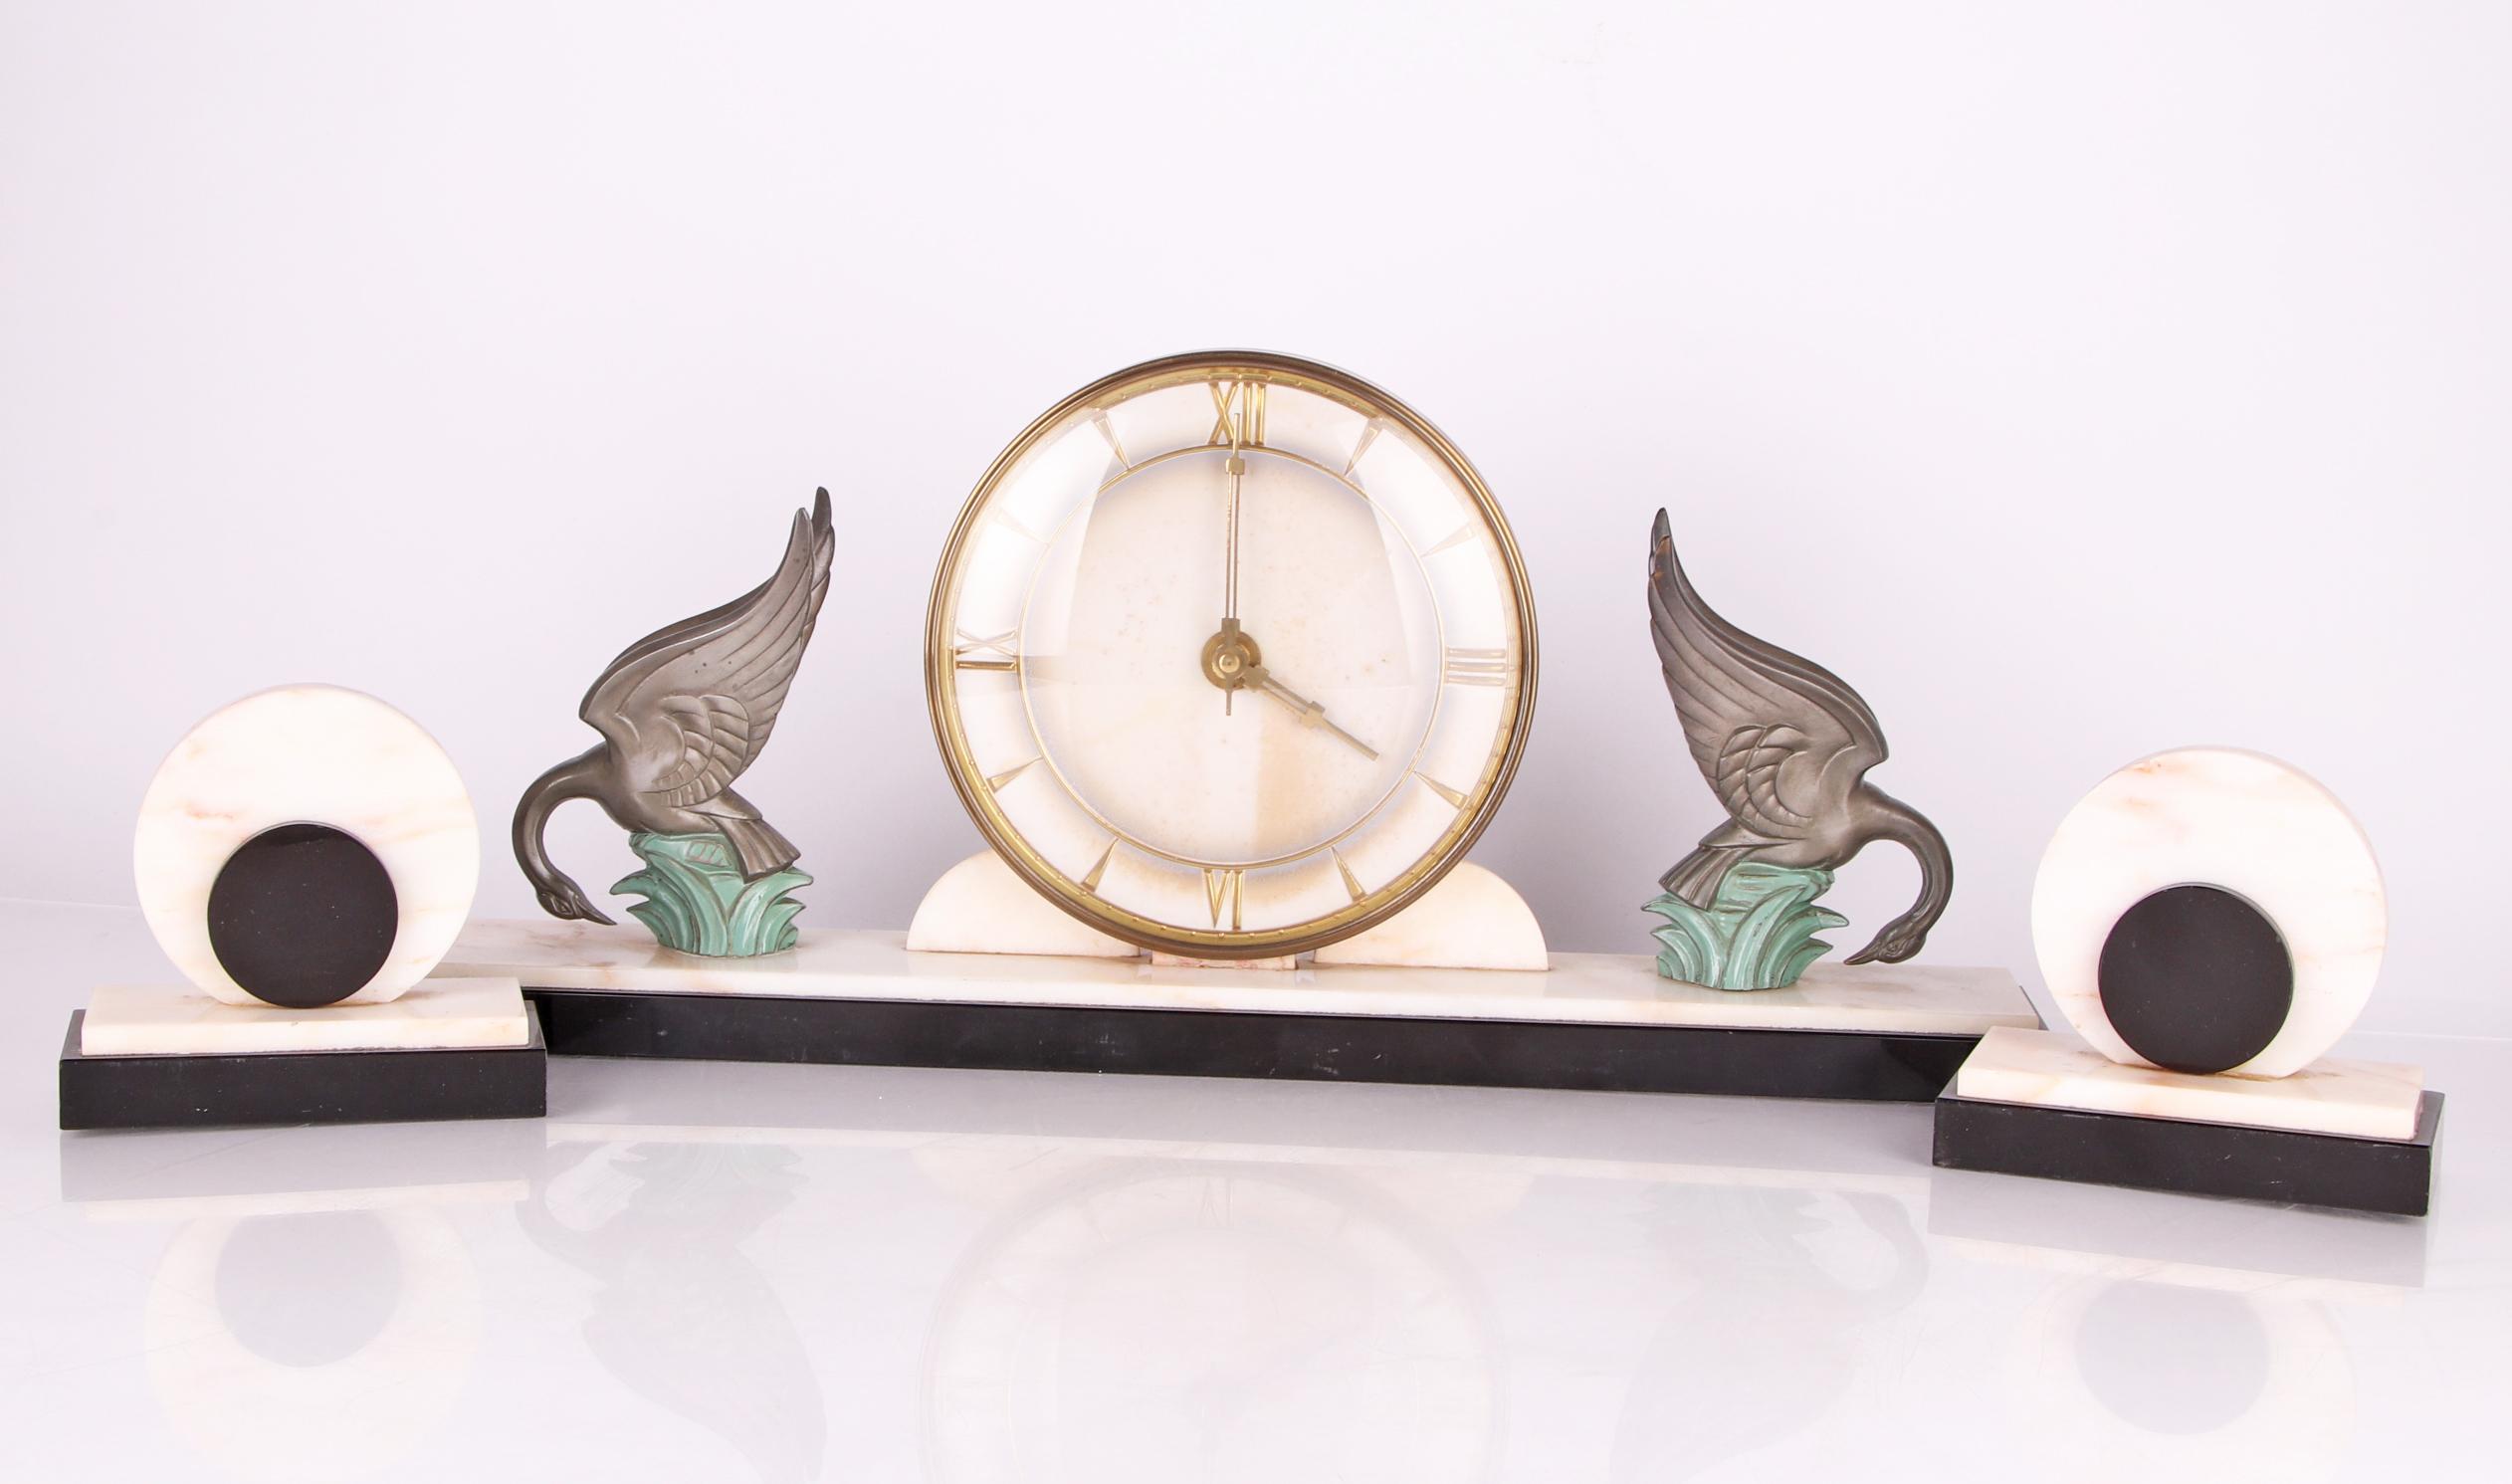 Art deco kaminuhr marmor uhr mantel clock figur figure schwan